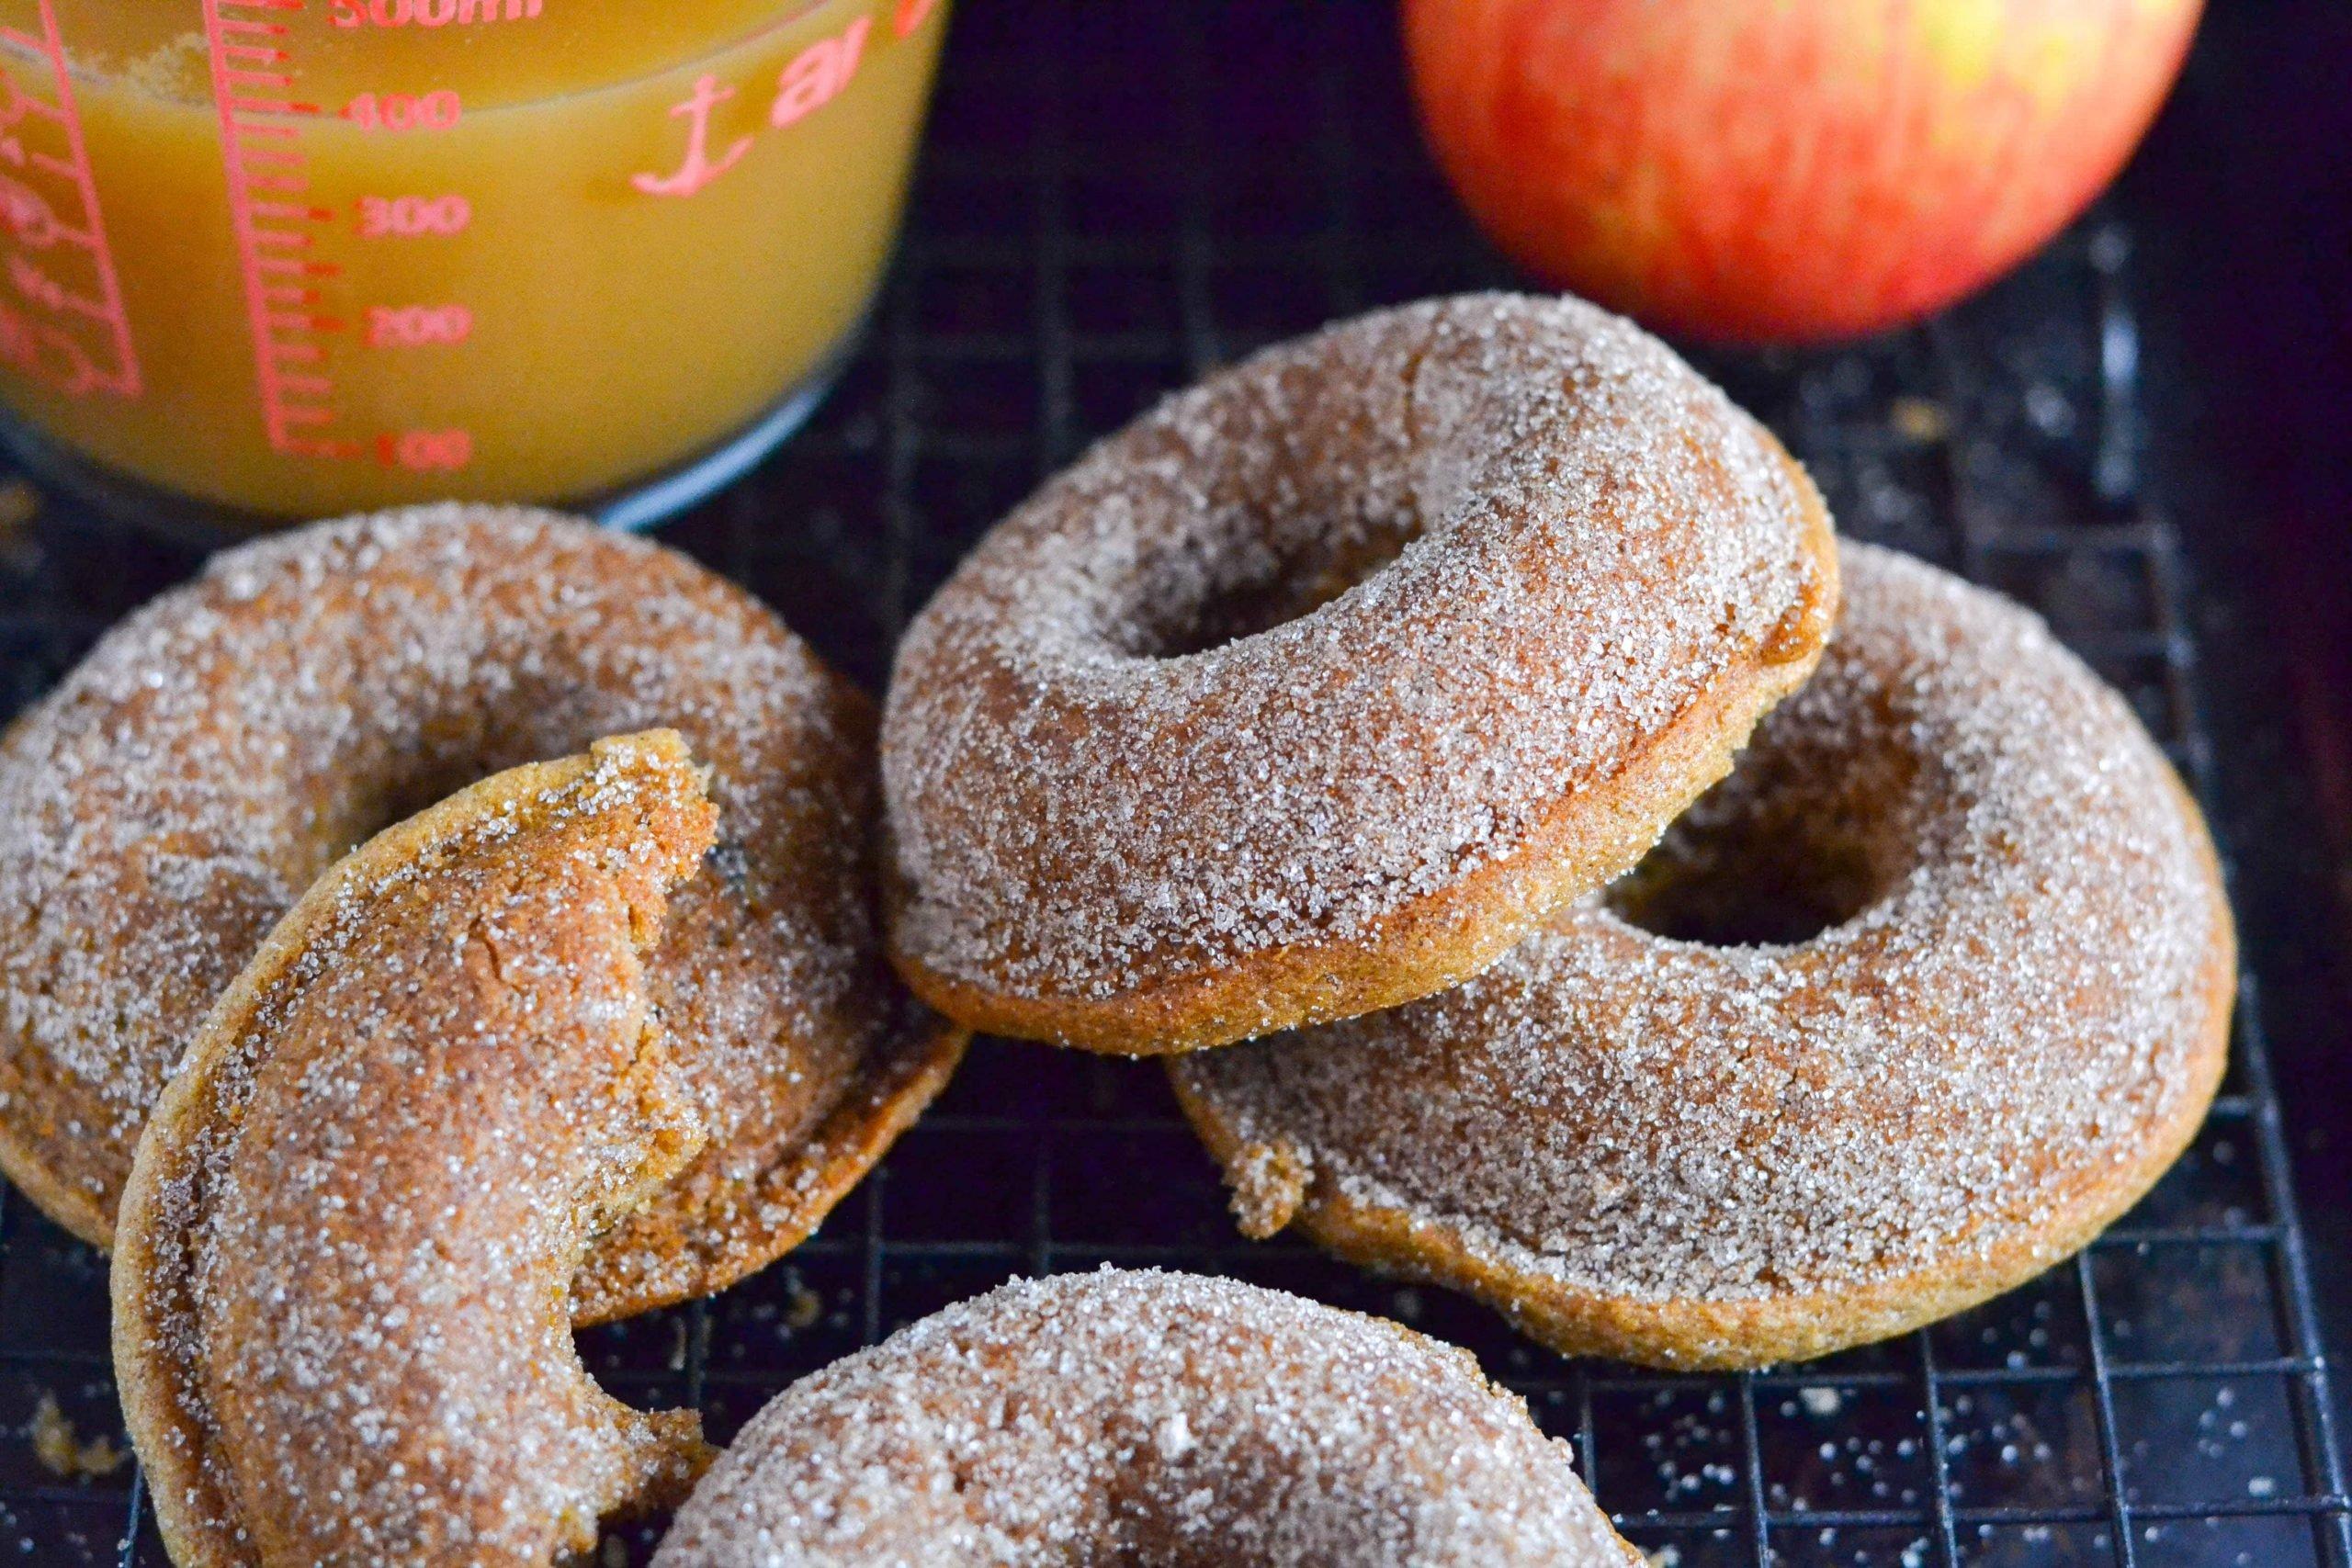 Gluten-Free Vegan Apple Cider Donuts (GF, DF, V) - A Dash of Megnut